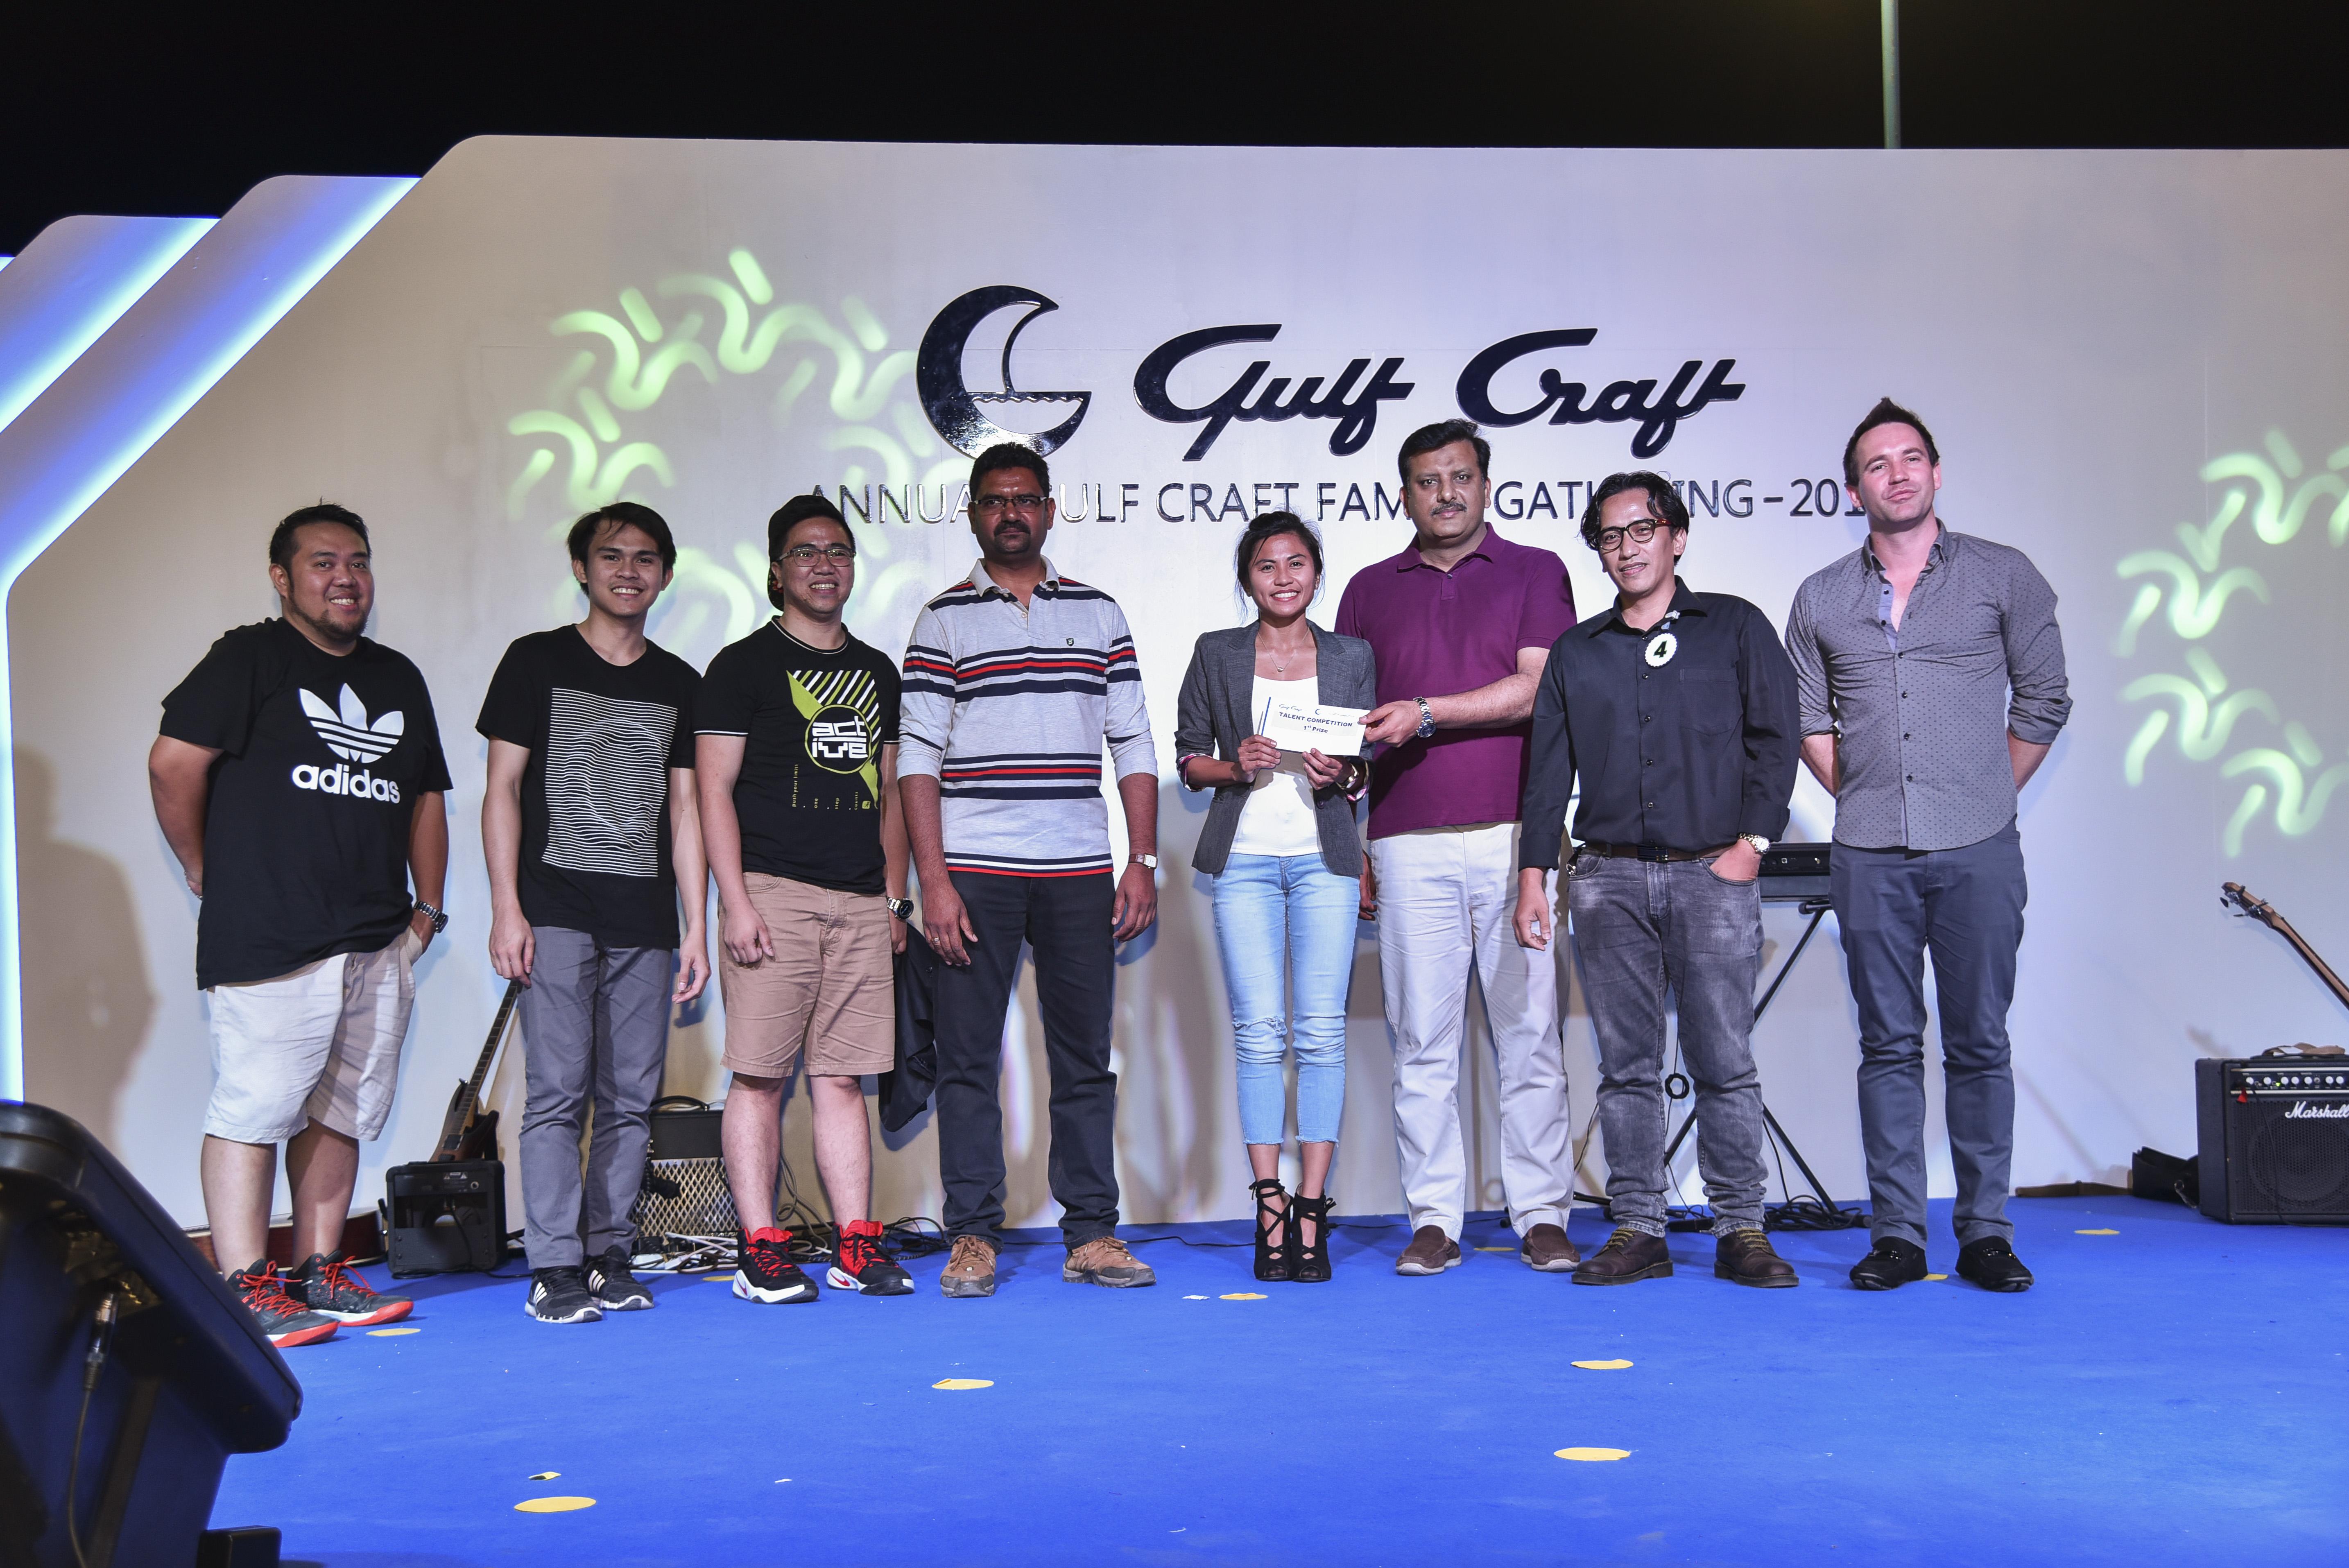 Gulf Craft's Annual Family Gathering 2018 (55).jpg